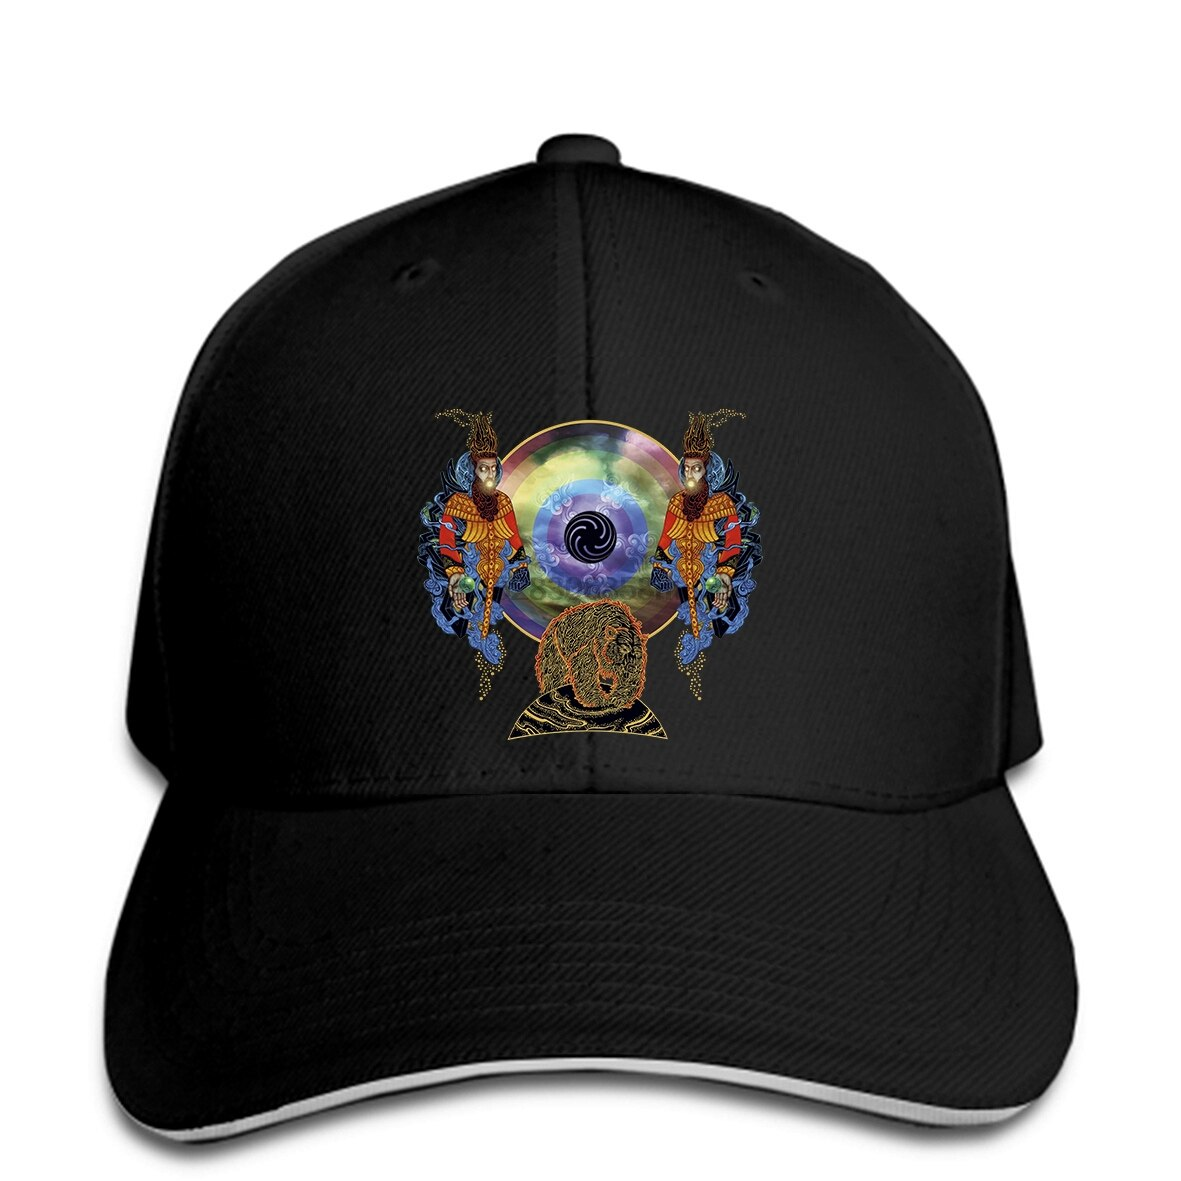 Mastodon Grip The Skye hombres gorra de béisbol sangre Montaña el cazador Lifesblood gorra Snapback mujeres sombrero pico